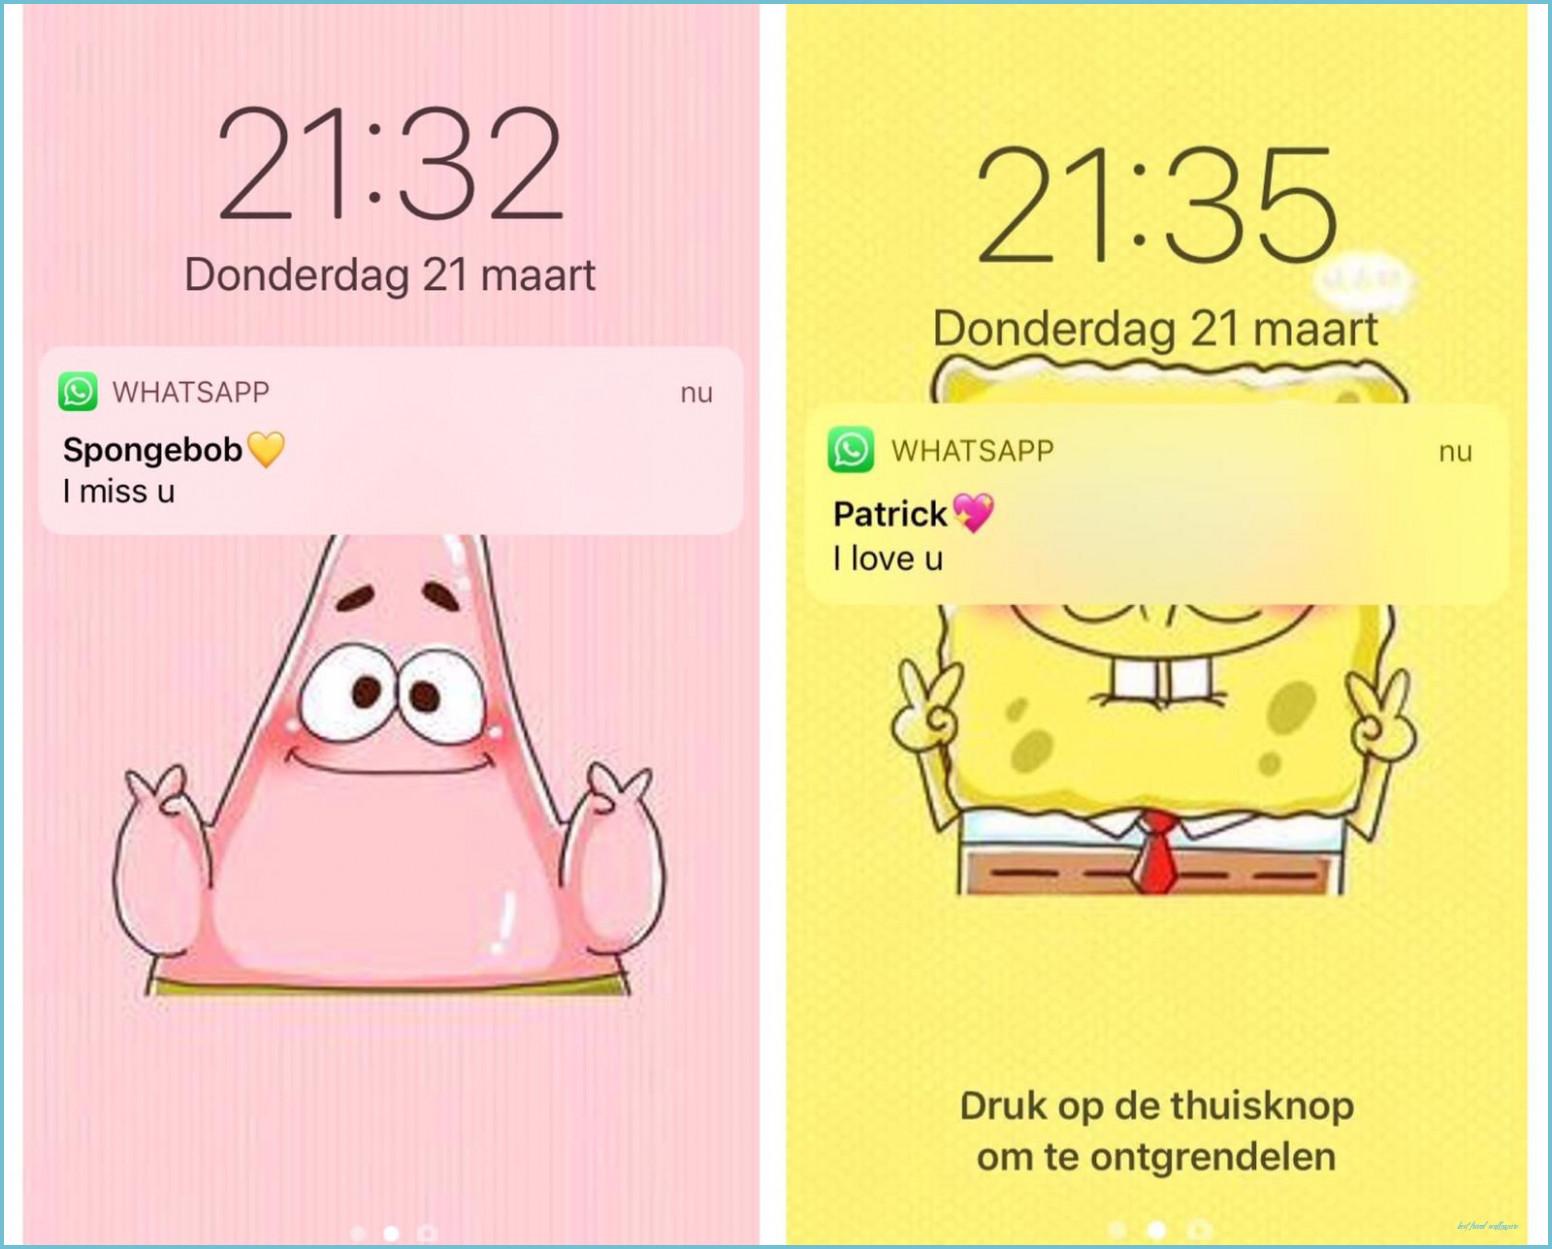 Vsco best friends SpongeBob Patric i miss u i love u   best 1552x1249